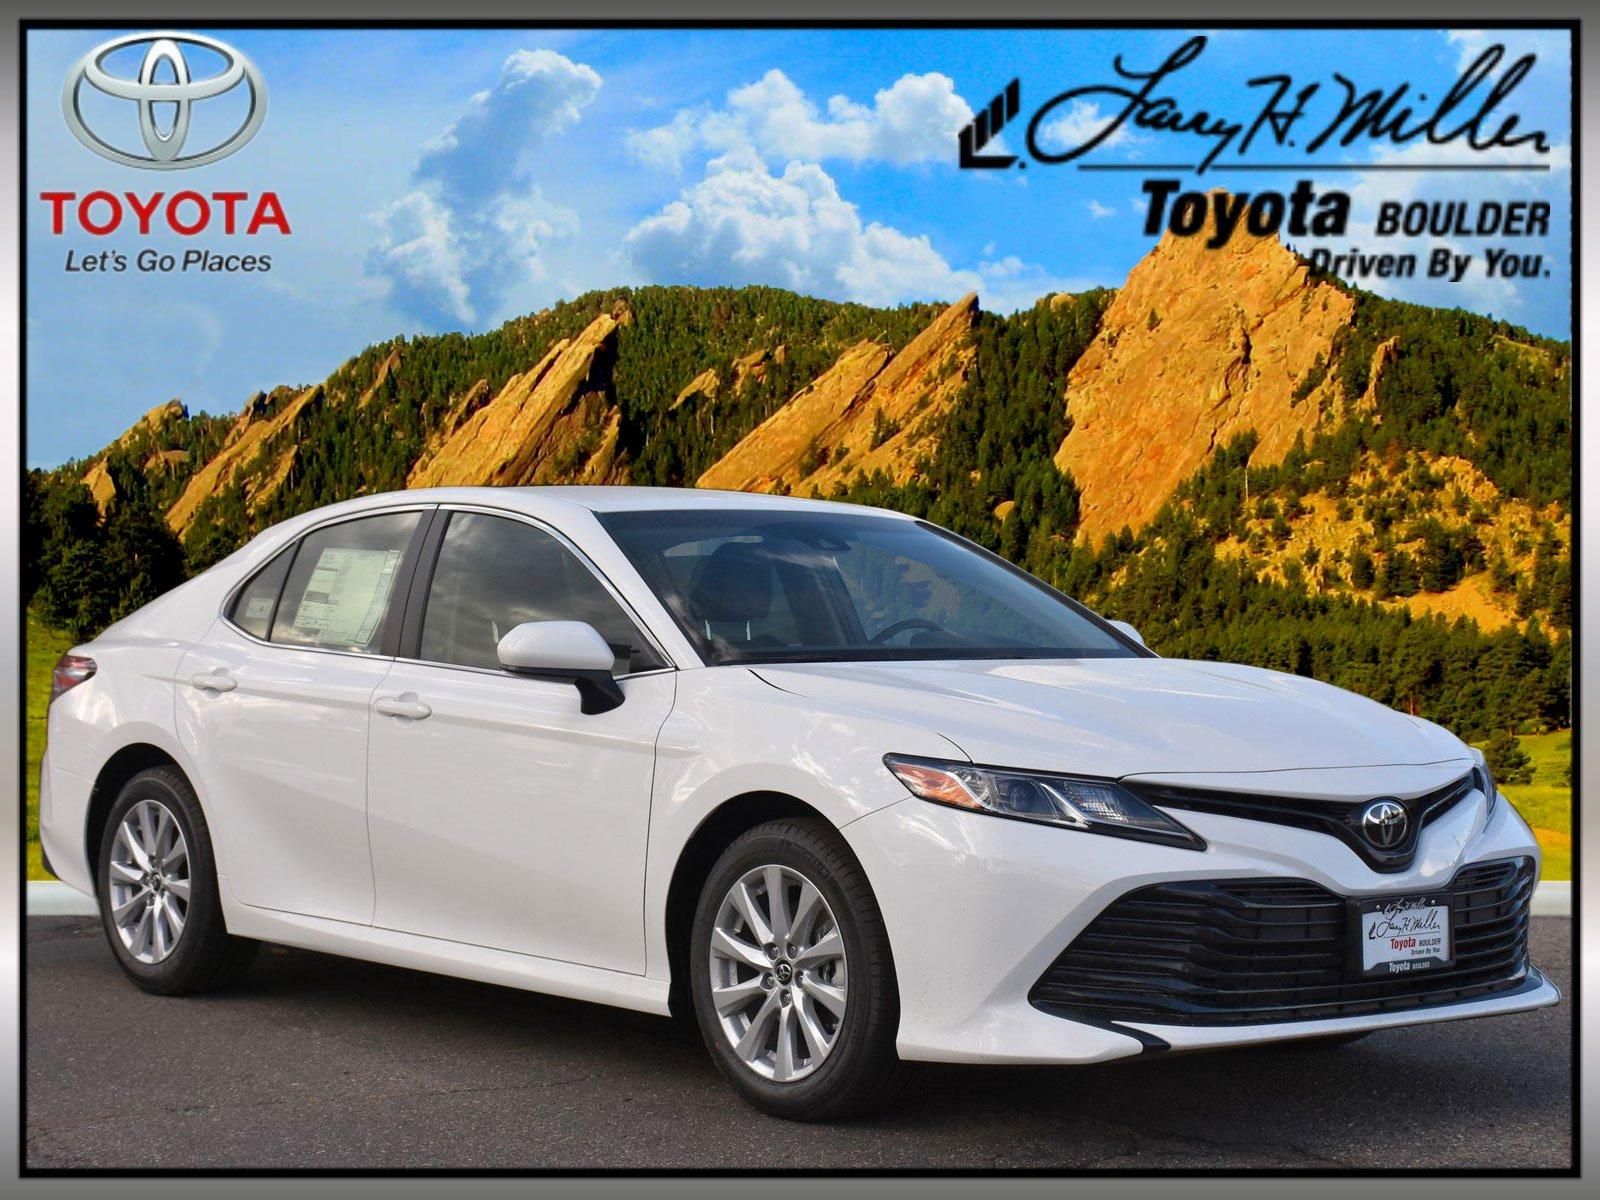 Toyota financing deals july 2018